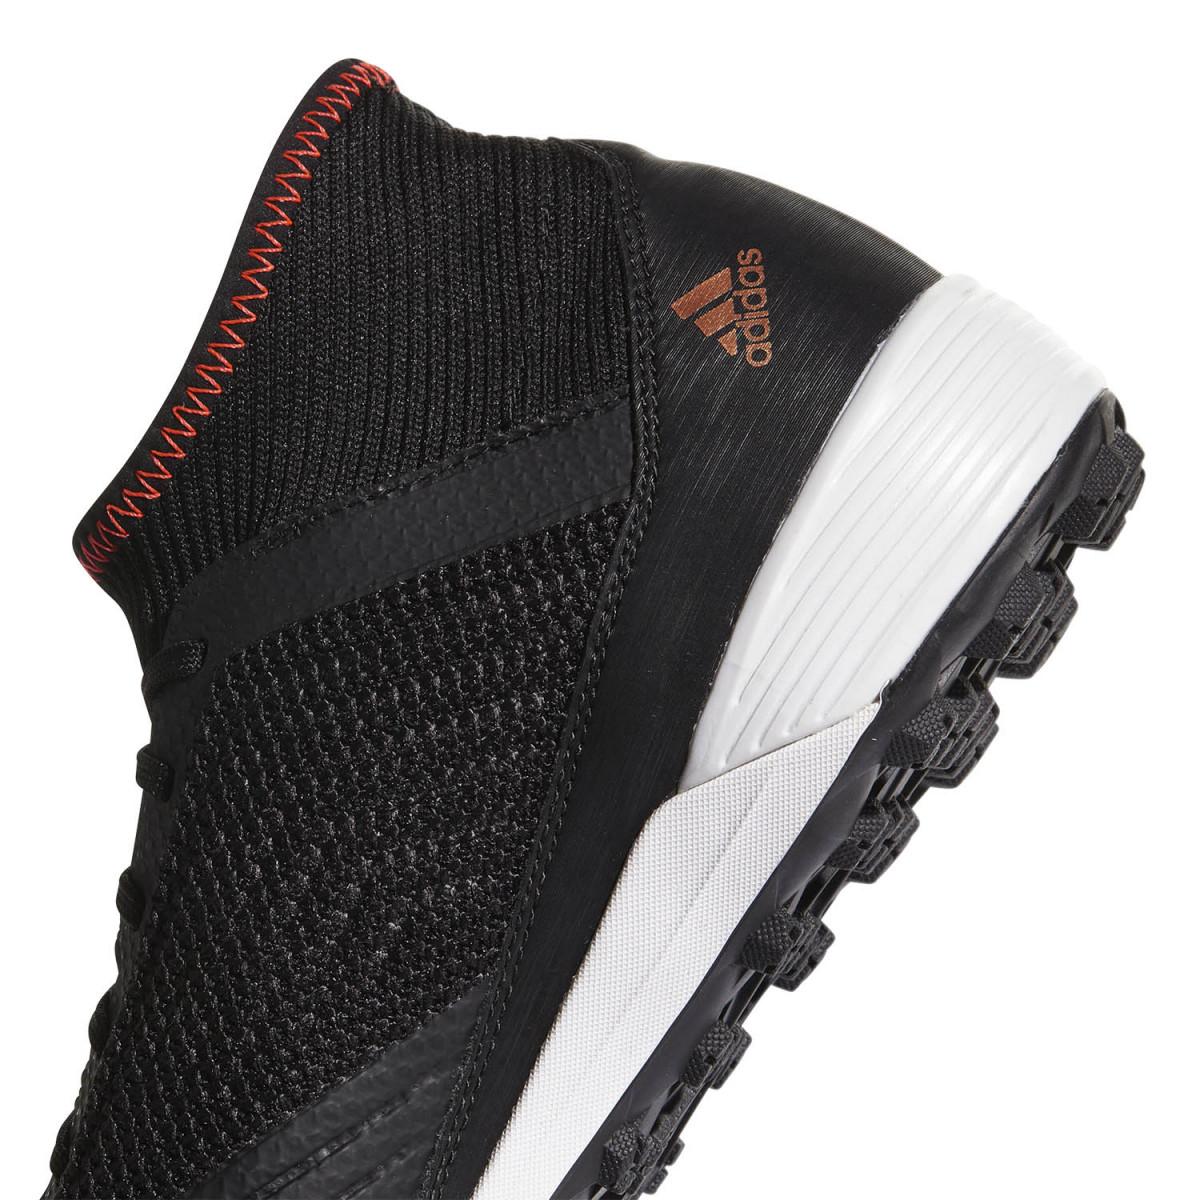 Botines Adidas Predator Tango 18.3 - Césped Sintético - Botines - Hombre d16fb1b5caa28